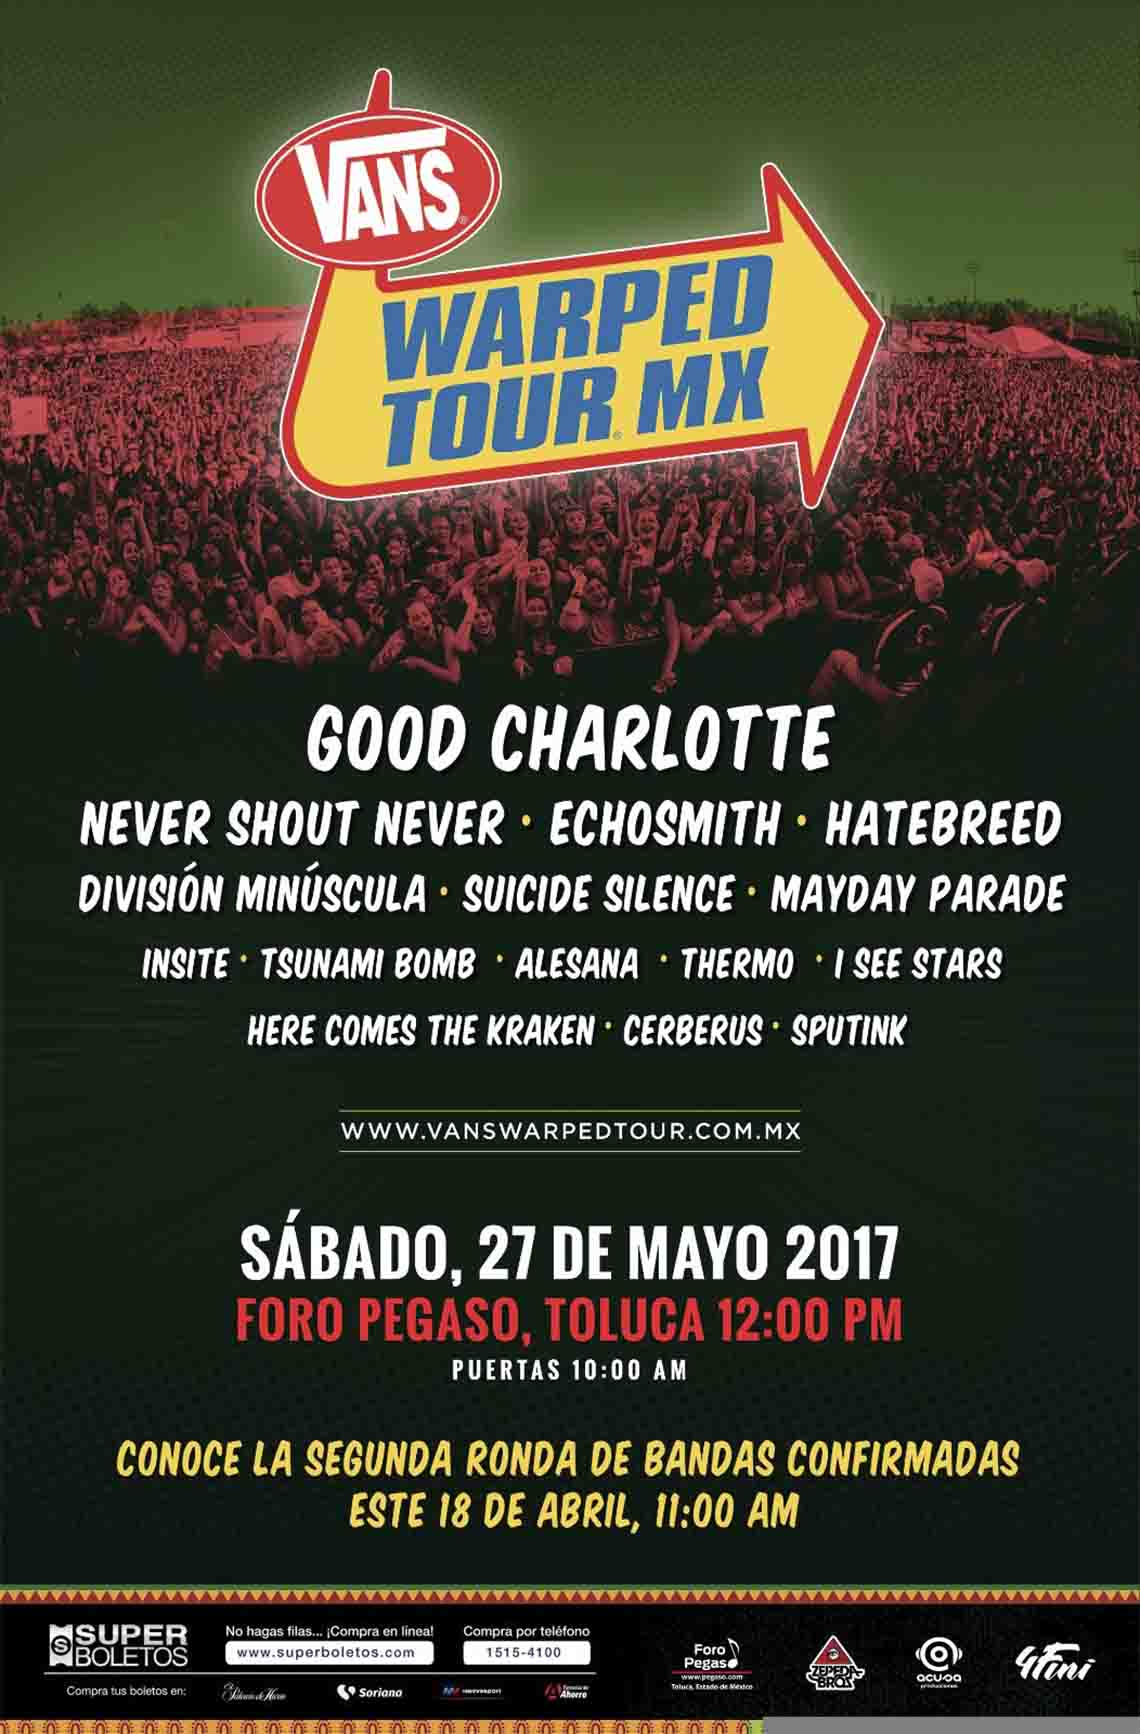 Warped tour 2017 dates